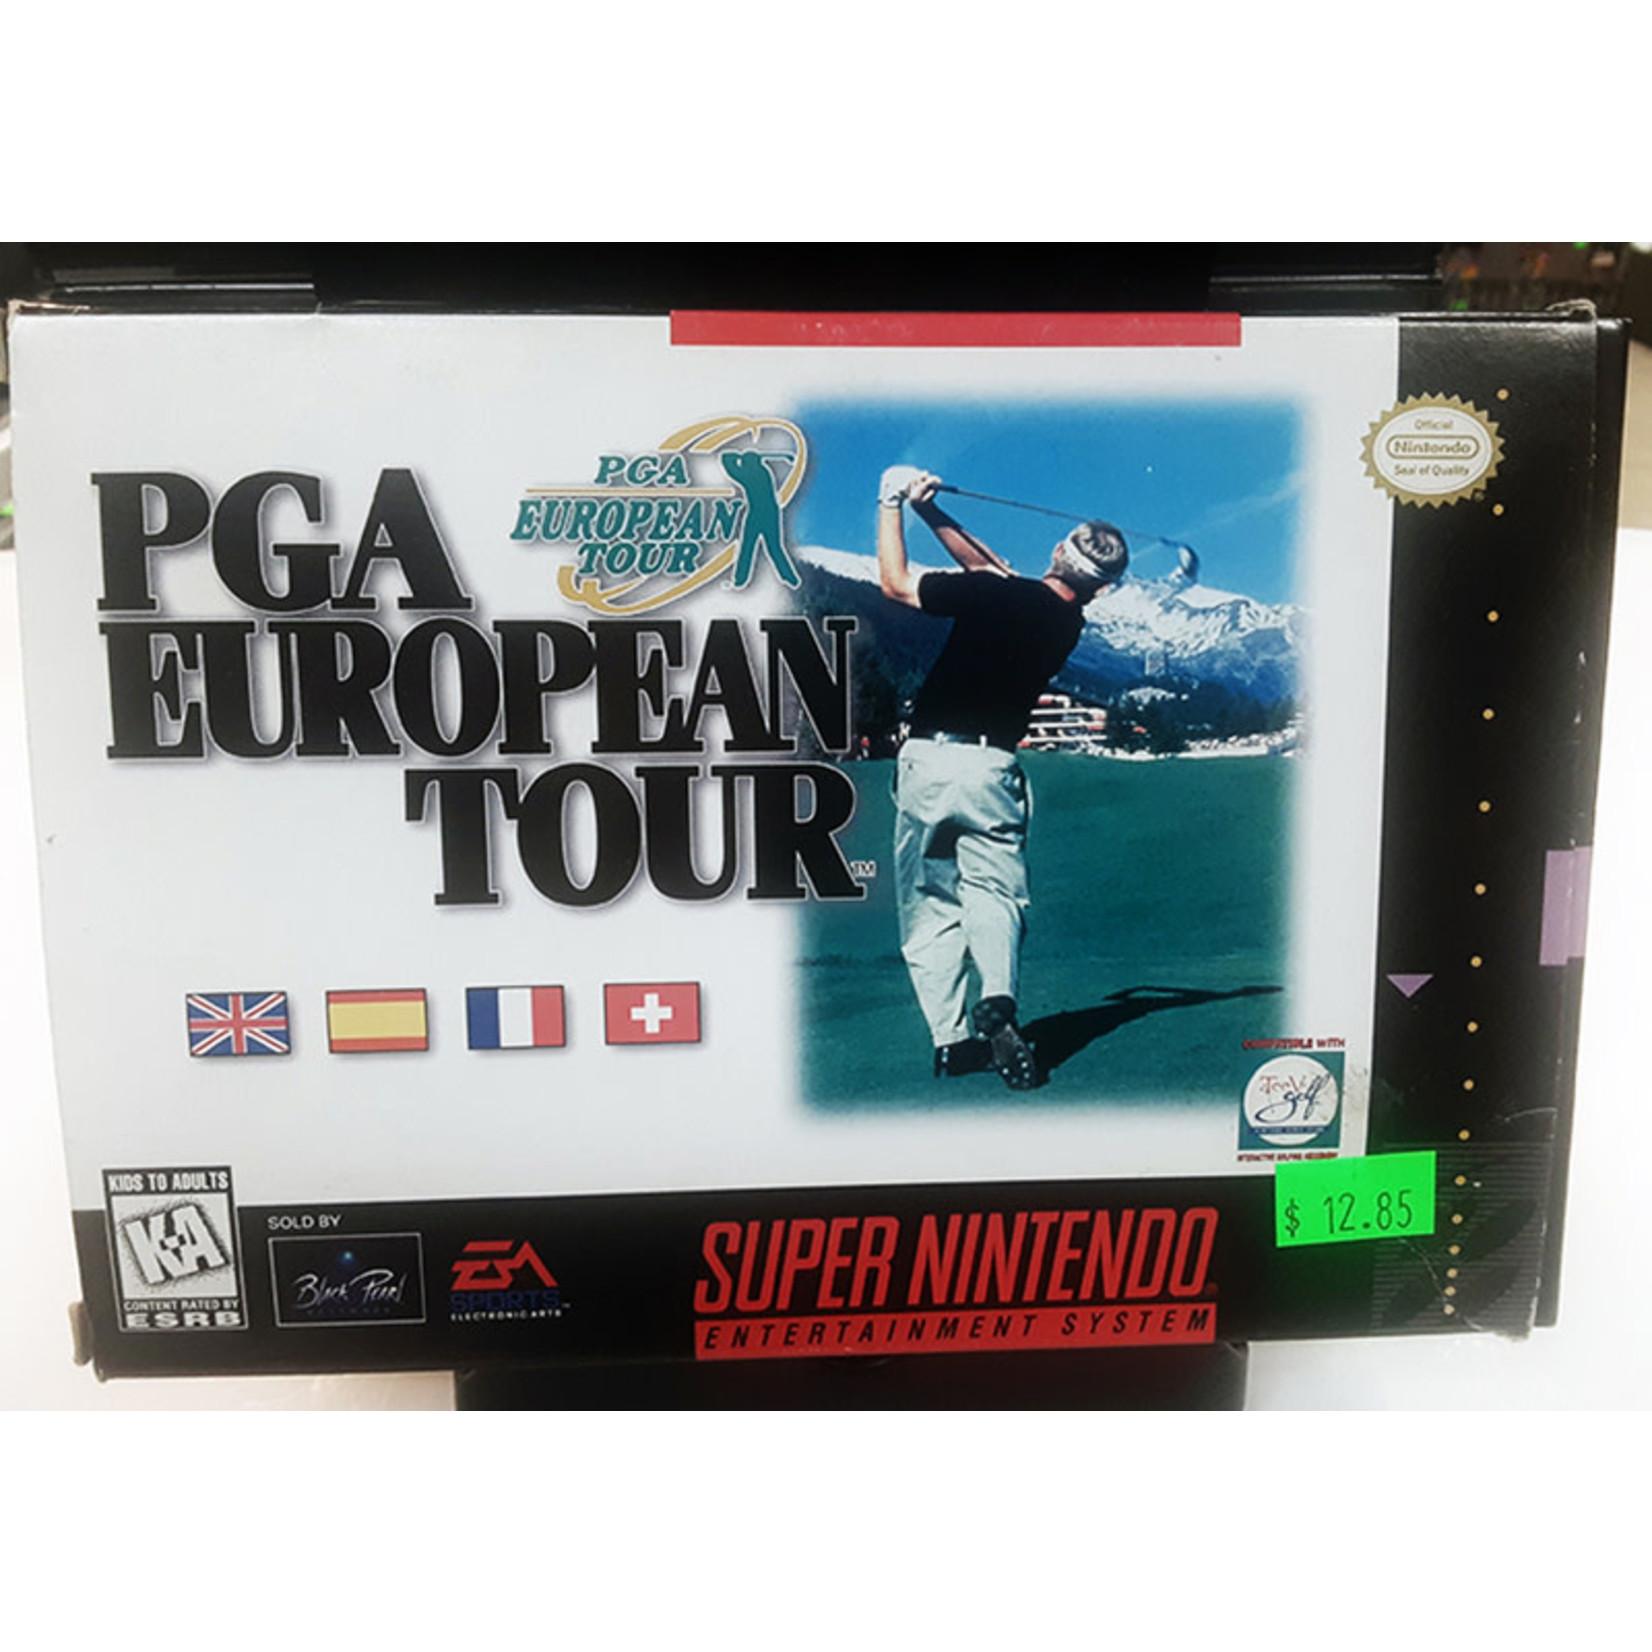 snesu-PGA European Tour (in box)